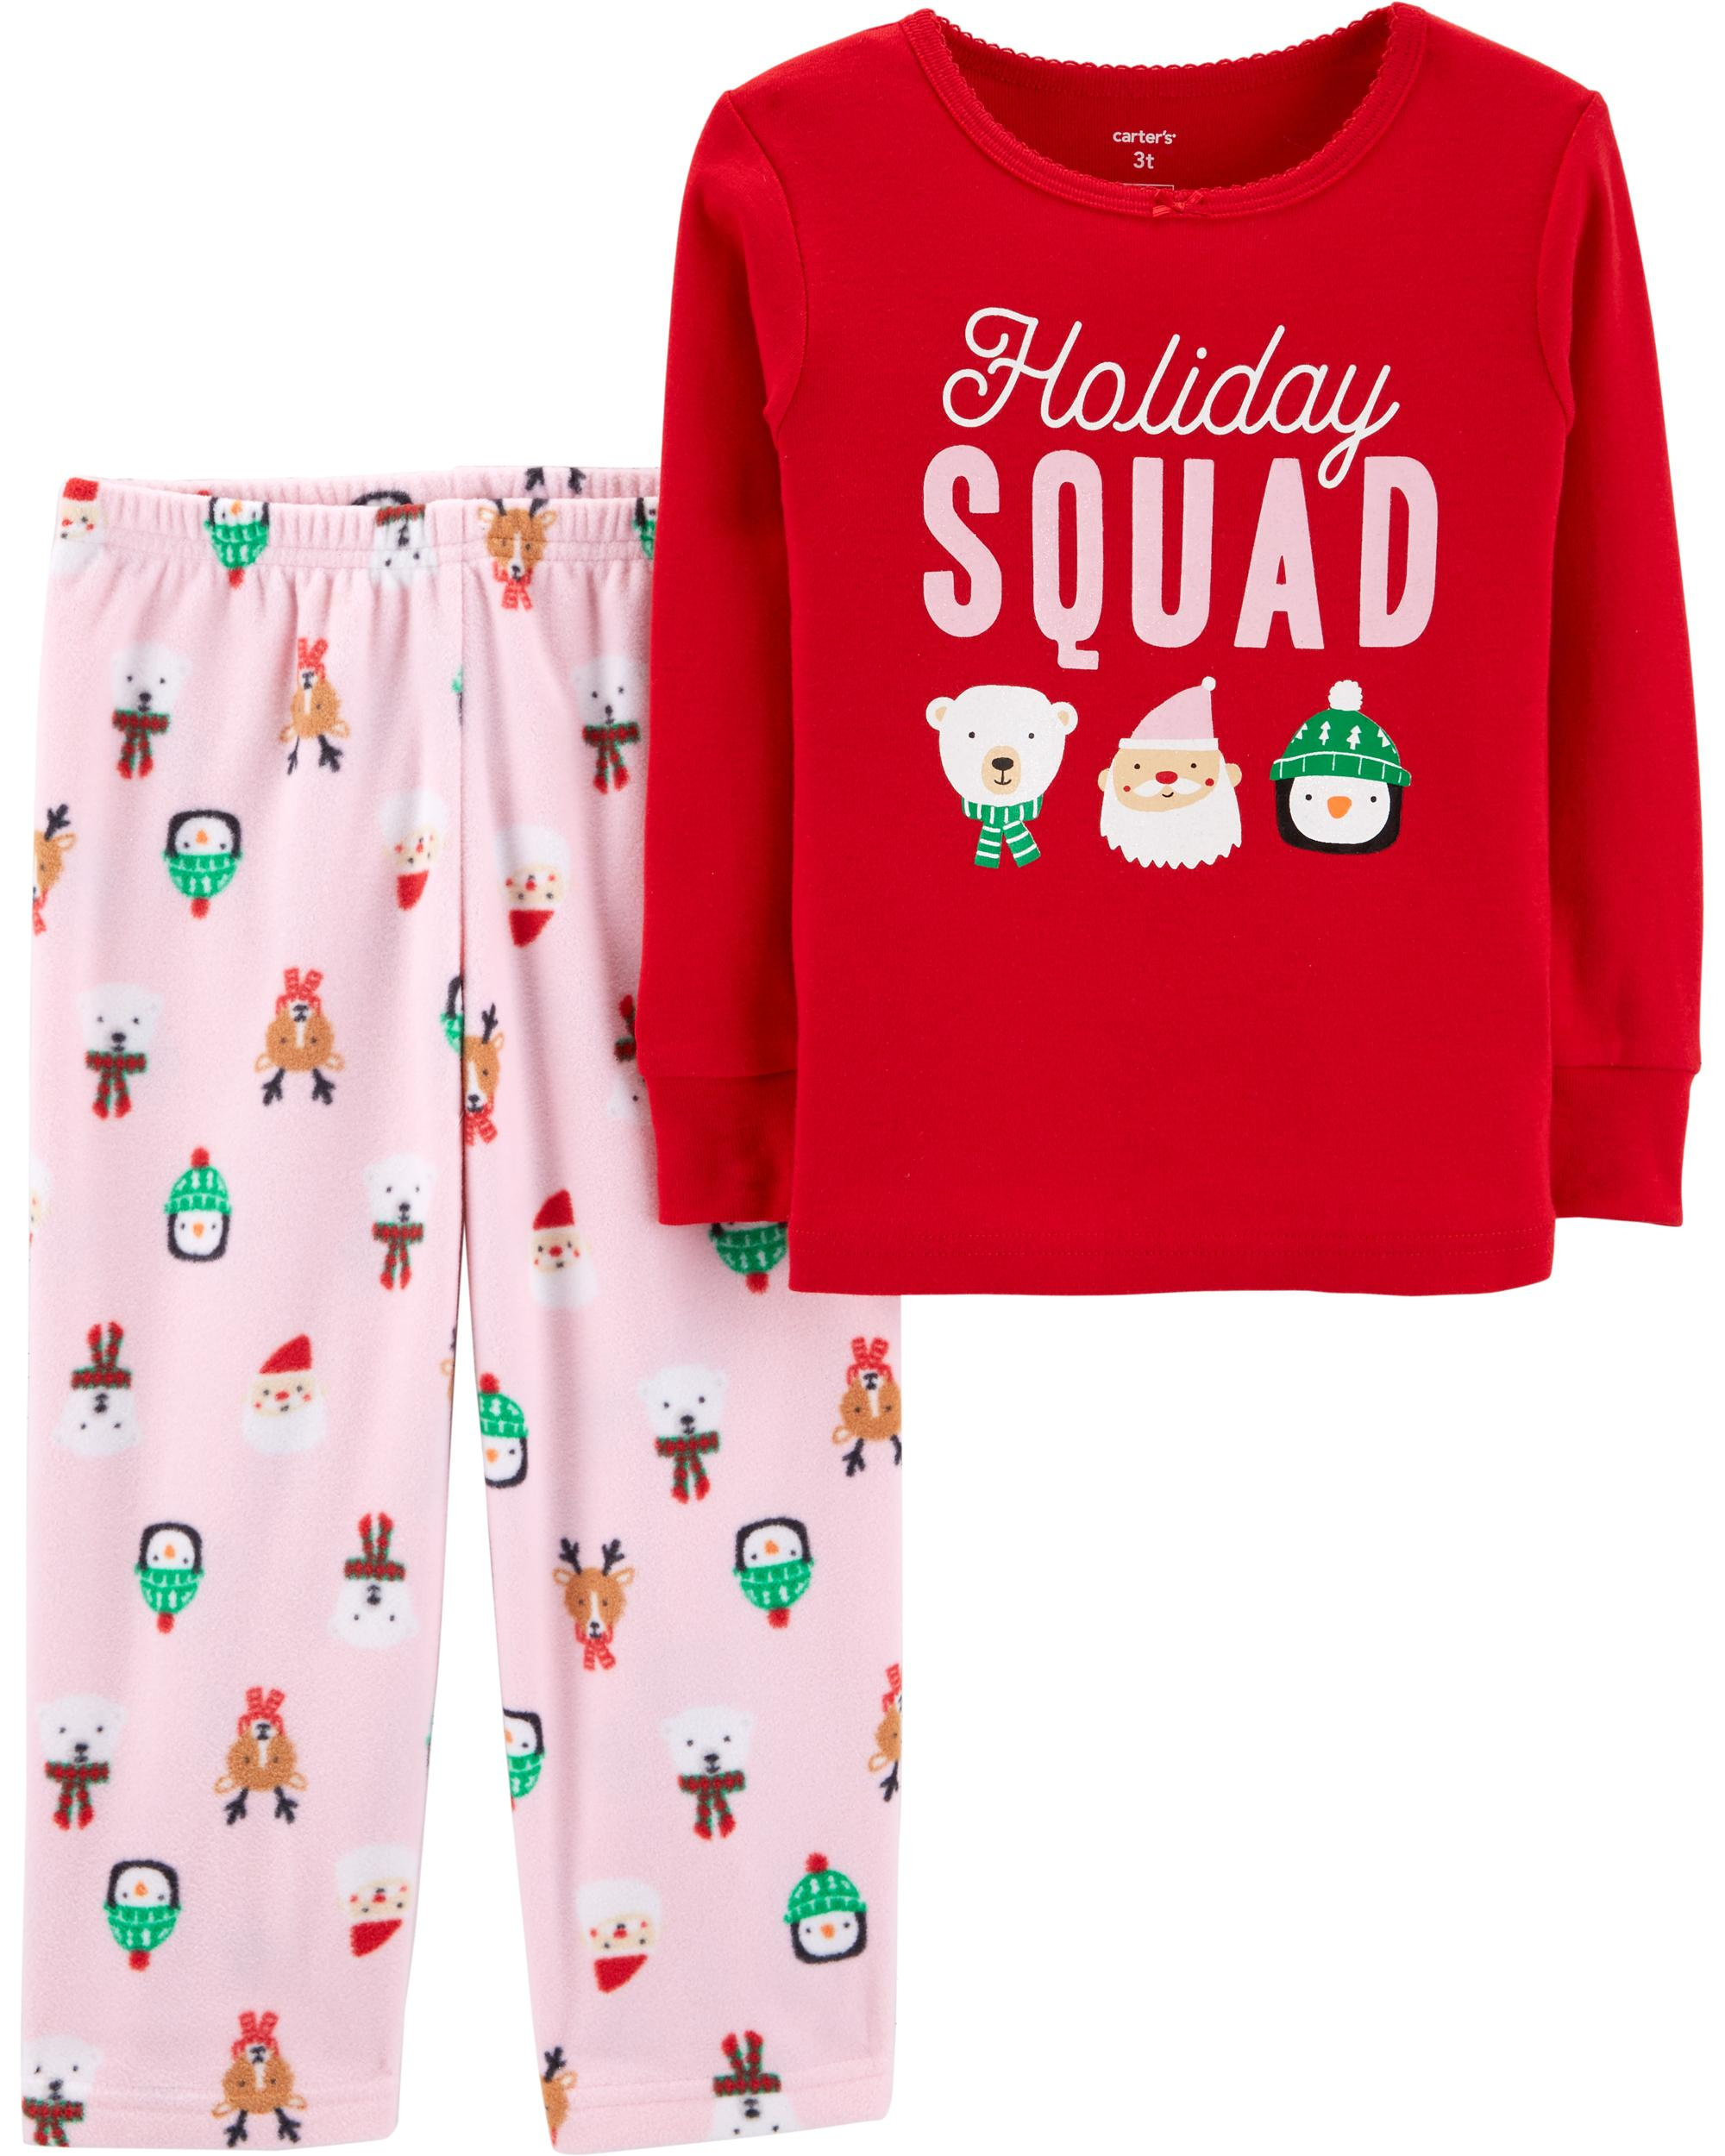 Toddler Christmas Pajamas.2 Piece Toddler Christmas Cotton Fleece Pjs Skiphop Com